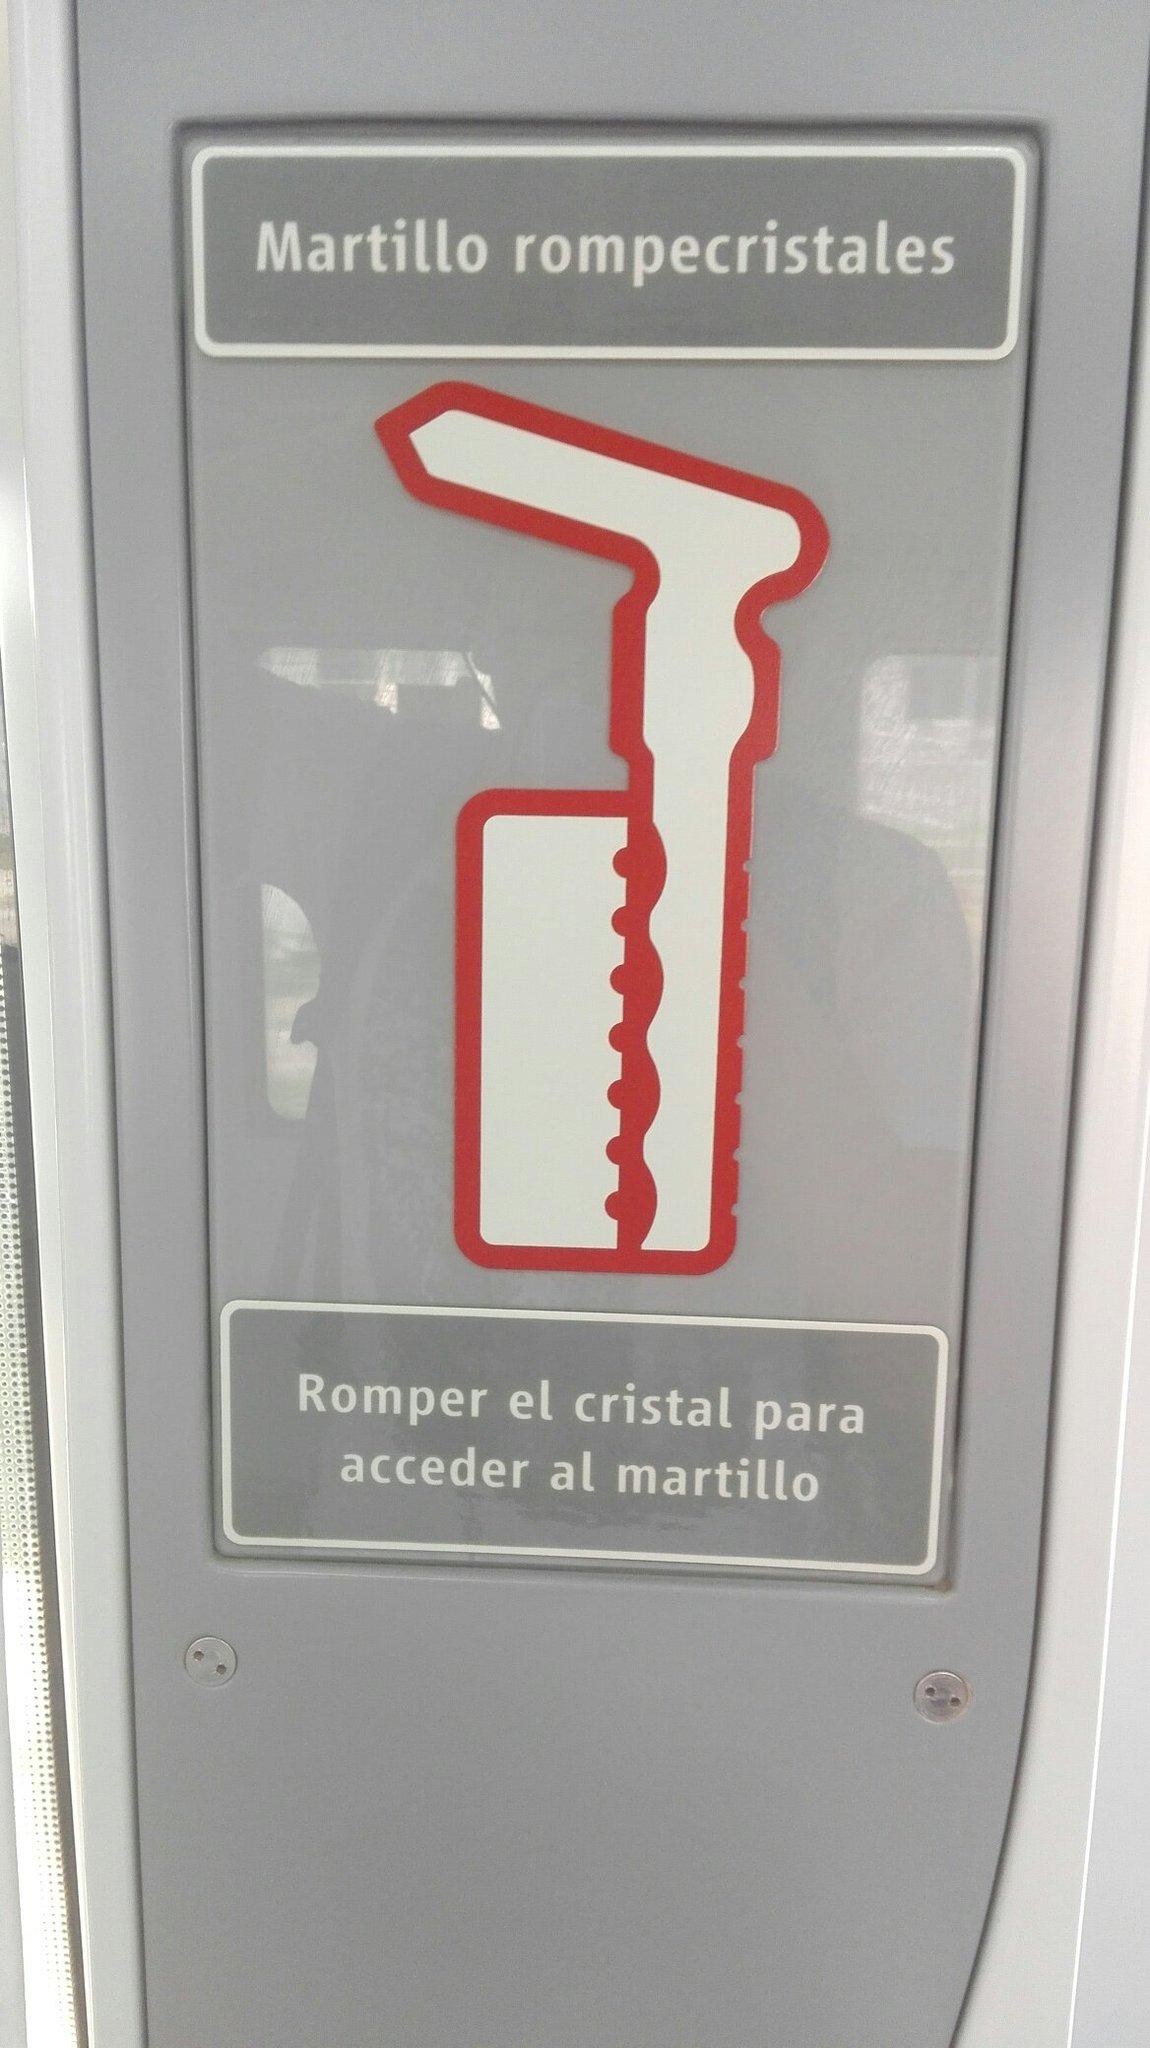 Gobierno de chile - meme